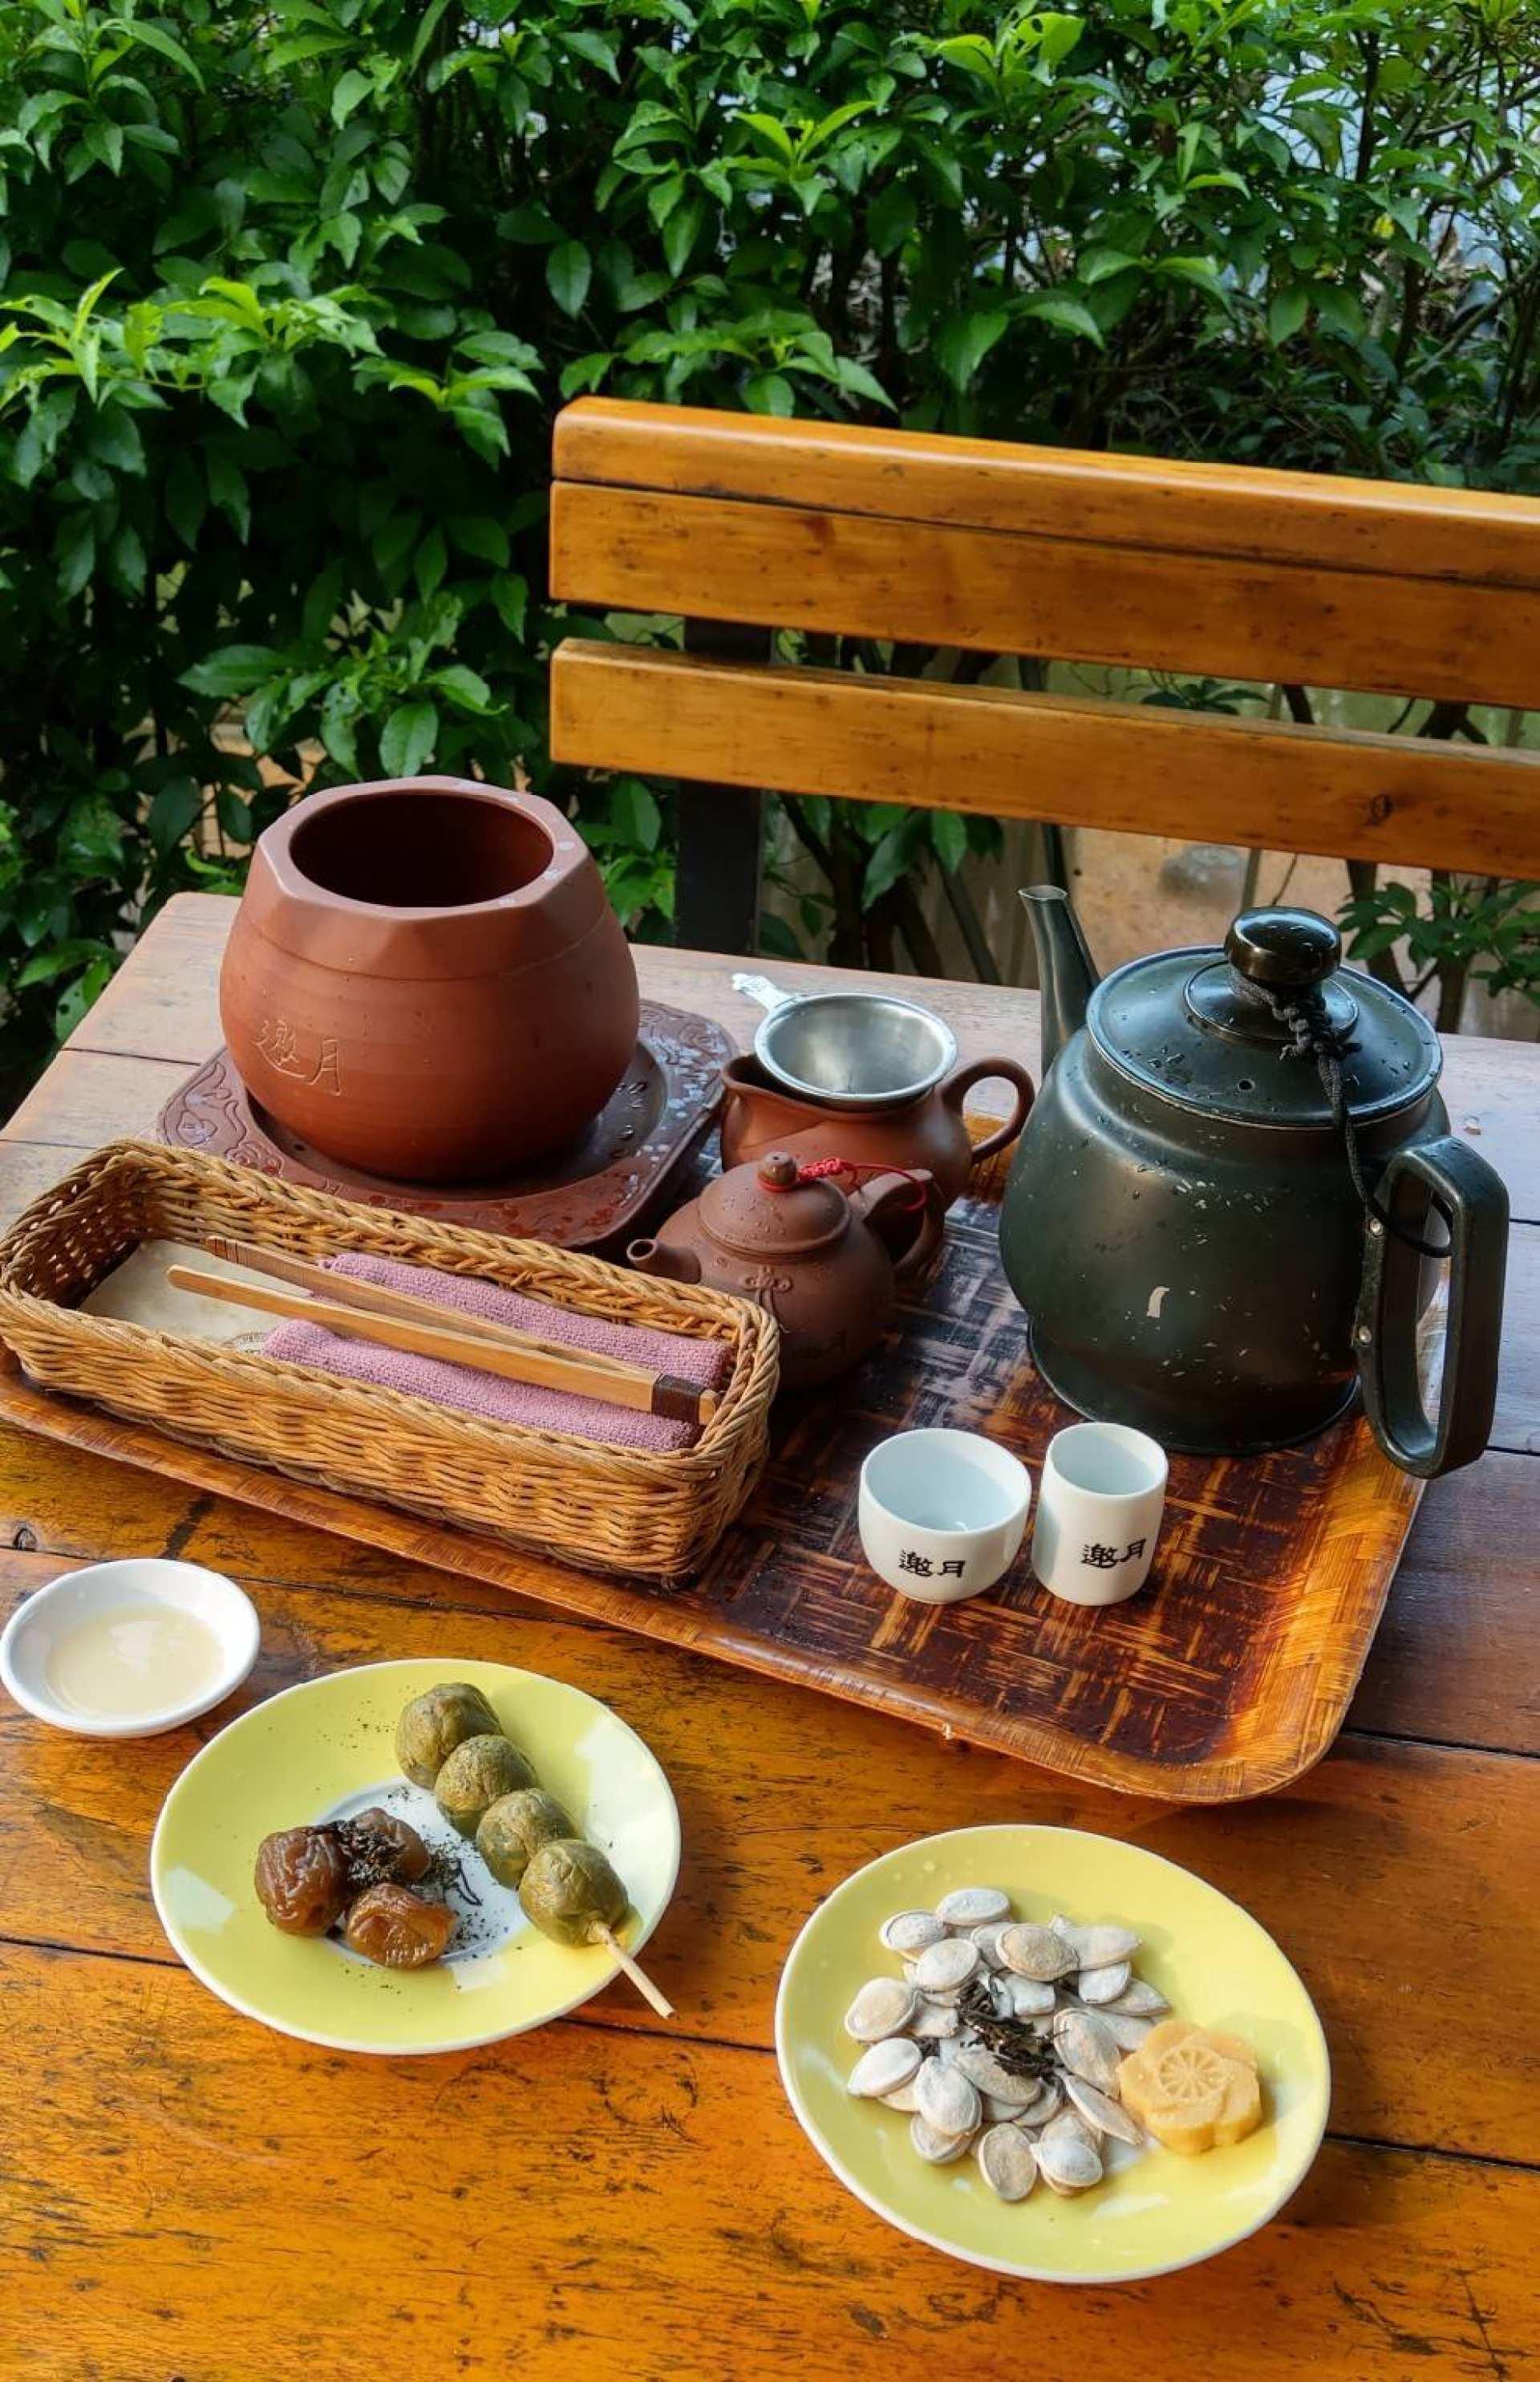 【貓空品茶趣】邀月茶坊24小時景觀泡茶套餐